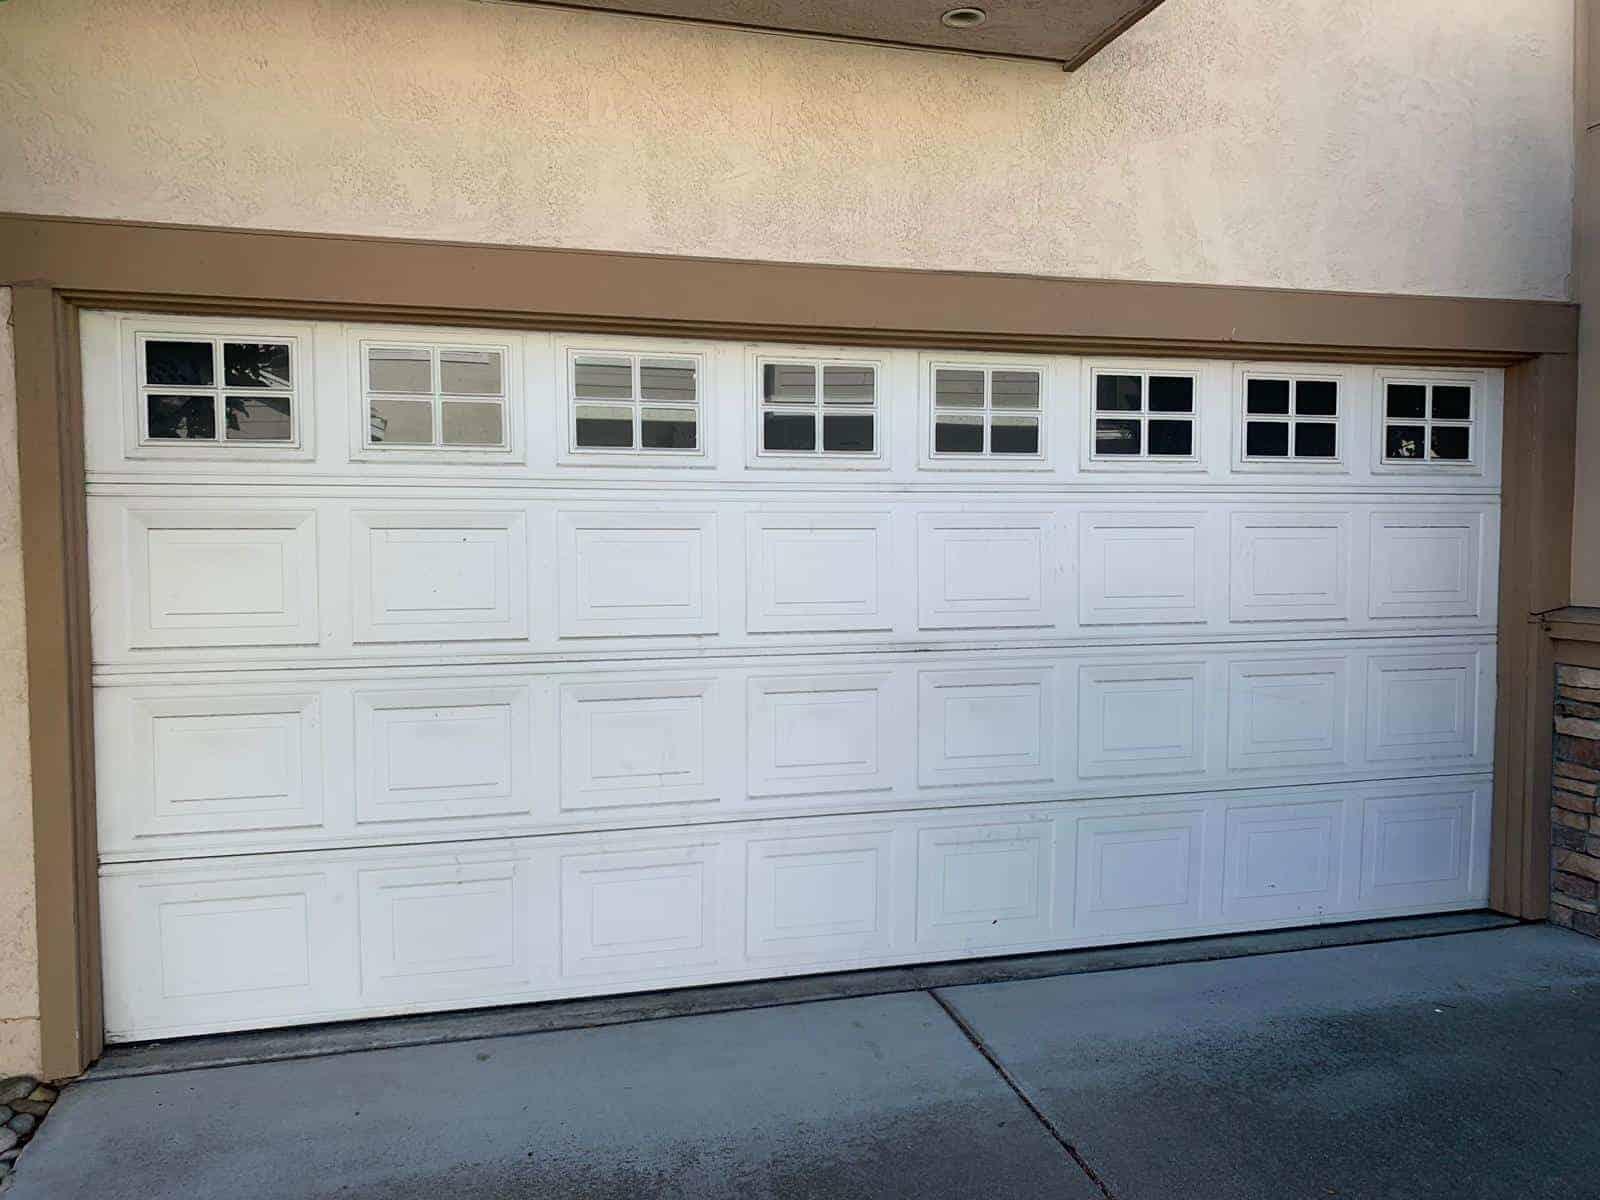 San Marino CA Garage Door Repair & Replacement